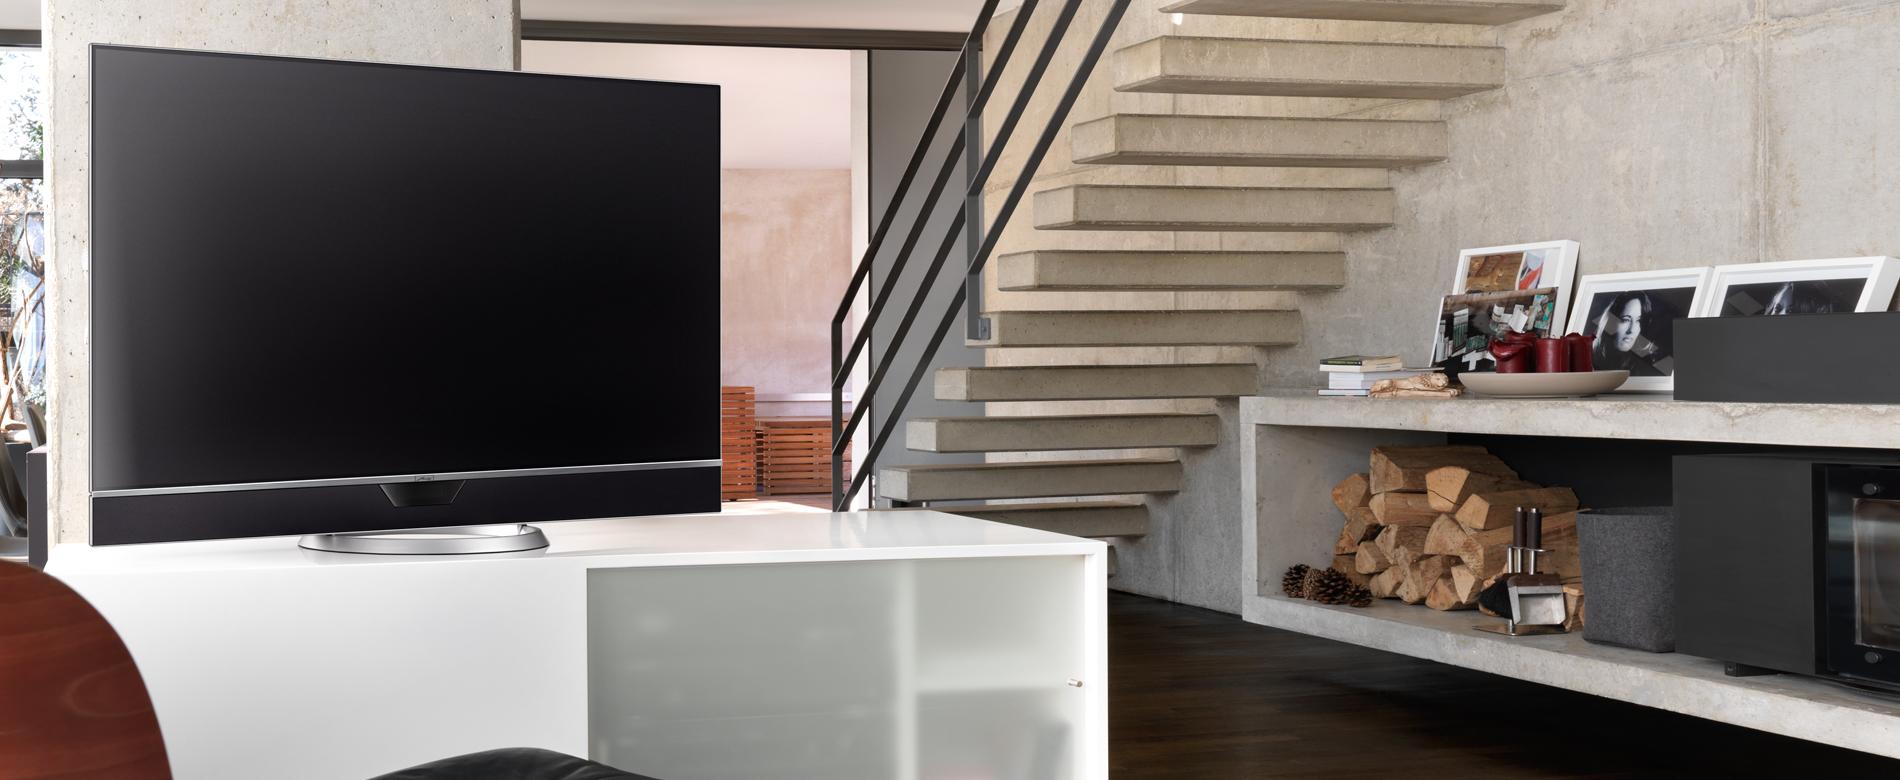 metz fernsehen erstklassig erleben made in germany. Black Bedroom Furniture Sets. Home Design Ideas